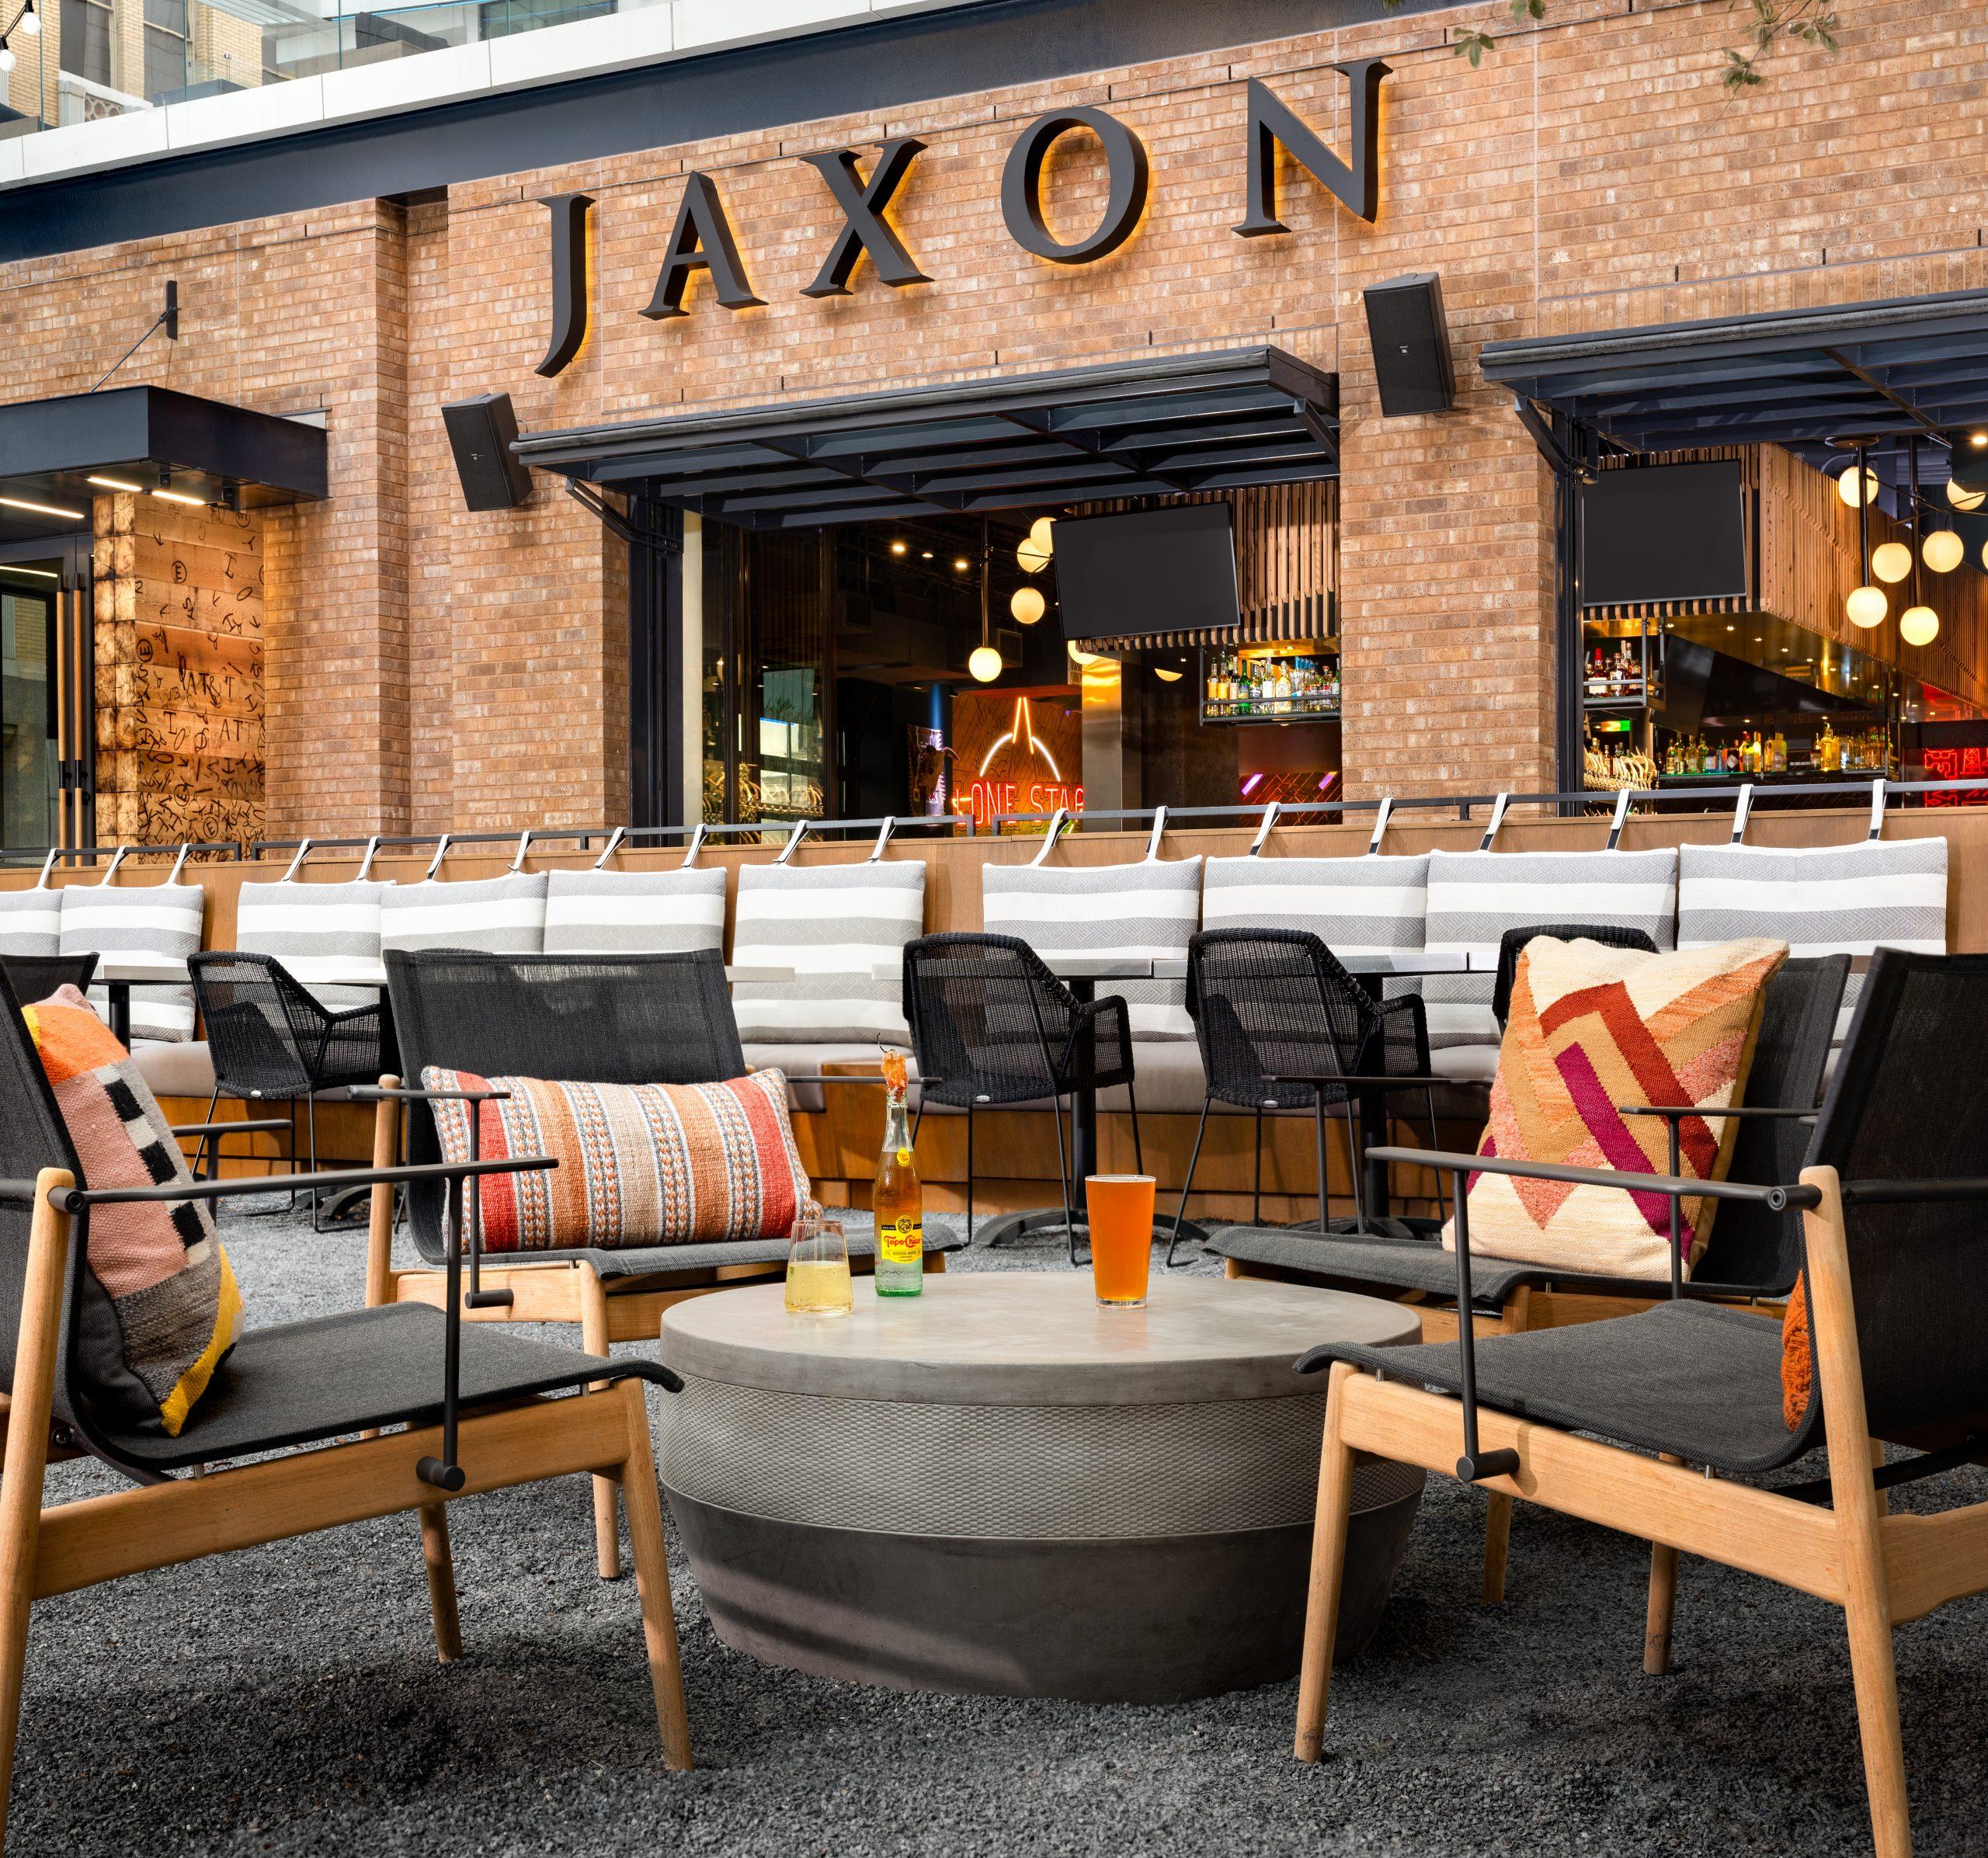 Jaxon Texas Kitchen & Beergarden